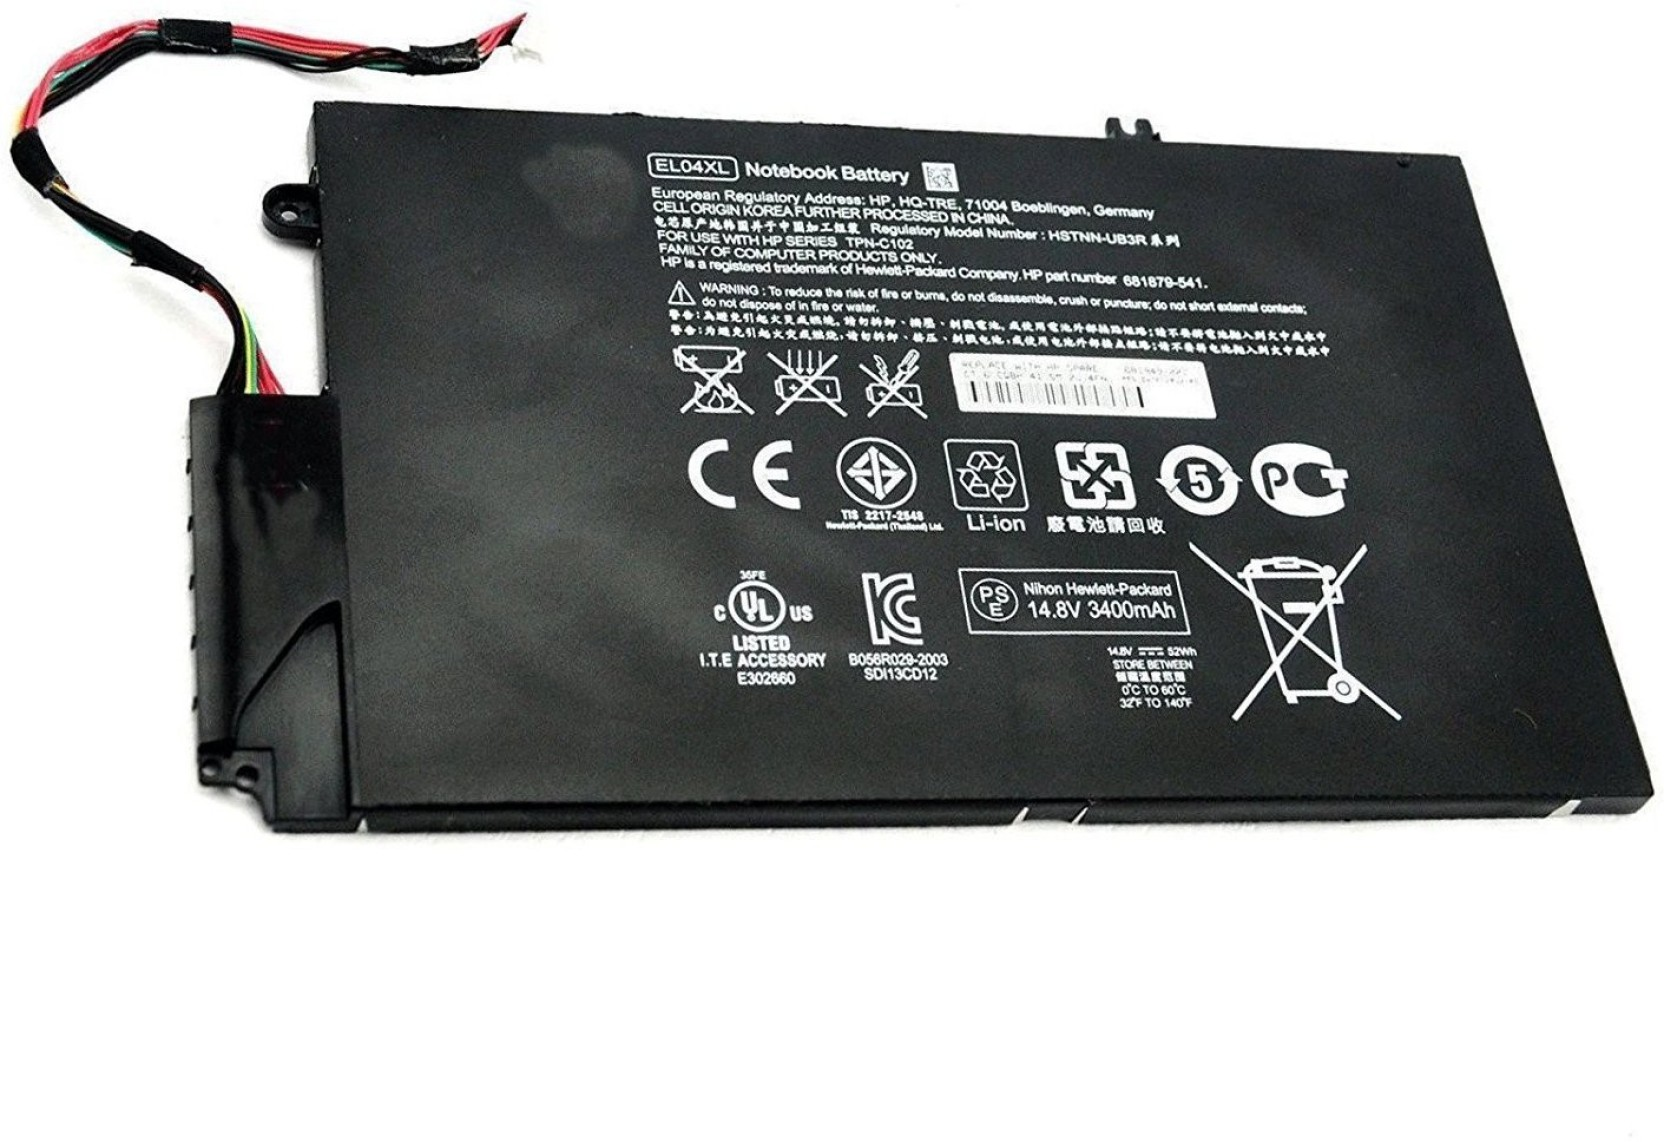 New for HP Envy 4,envy 4-1000,4-1200,4-1218TU,4-1106tx laptop keyboard black